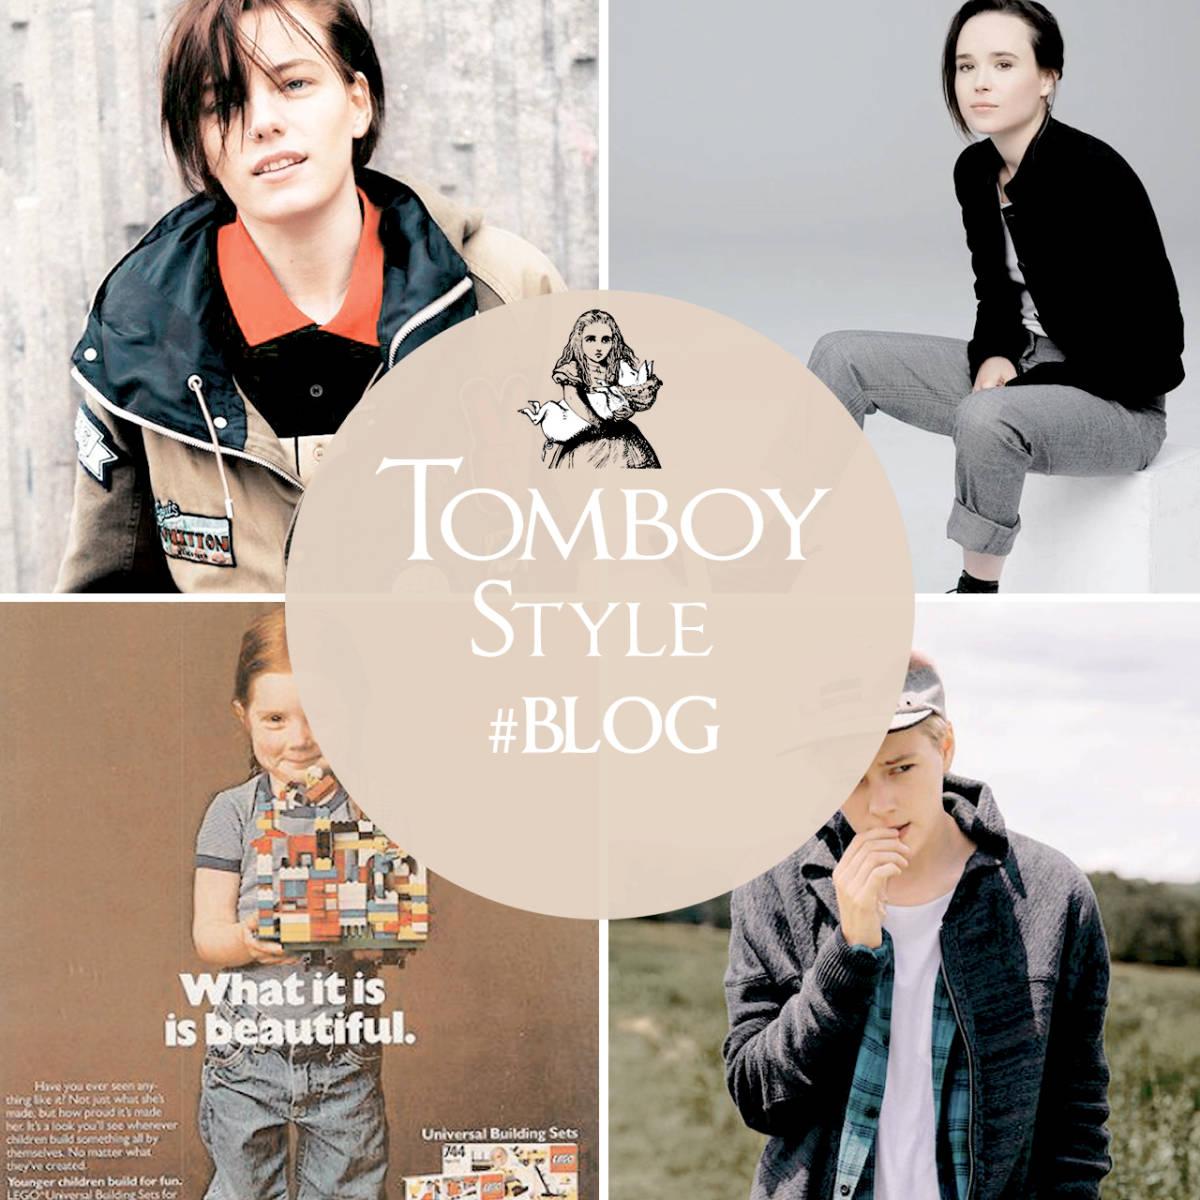 Tomboy style - Alice's Pig Blog